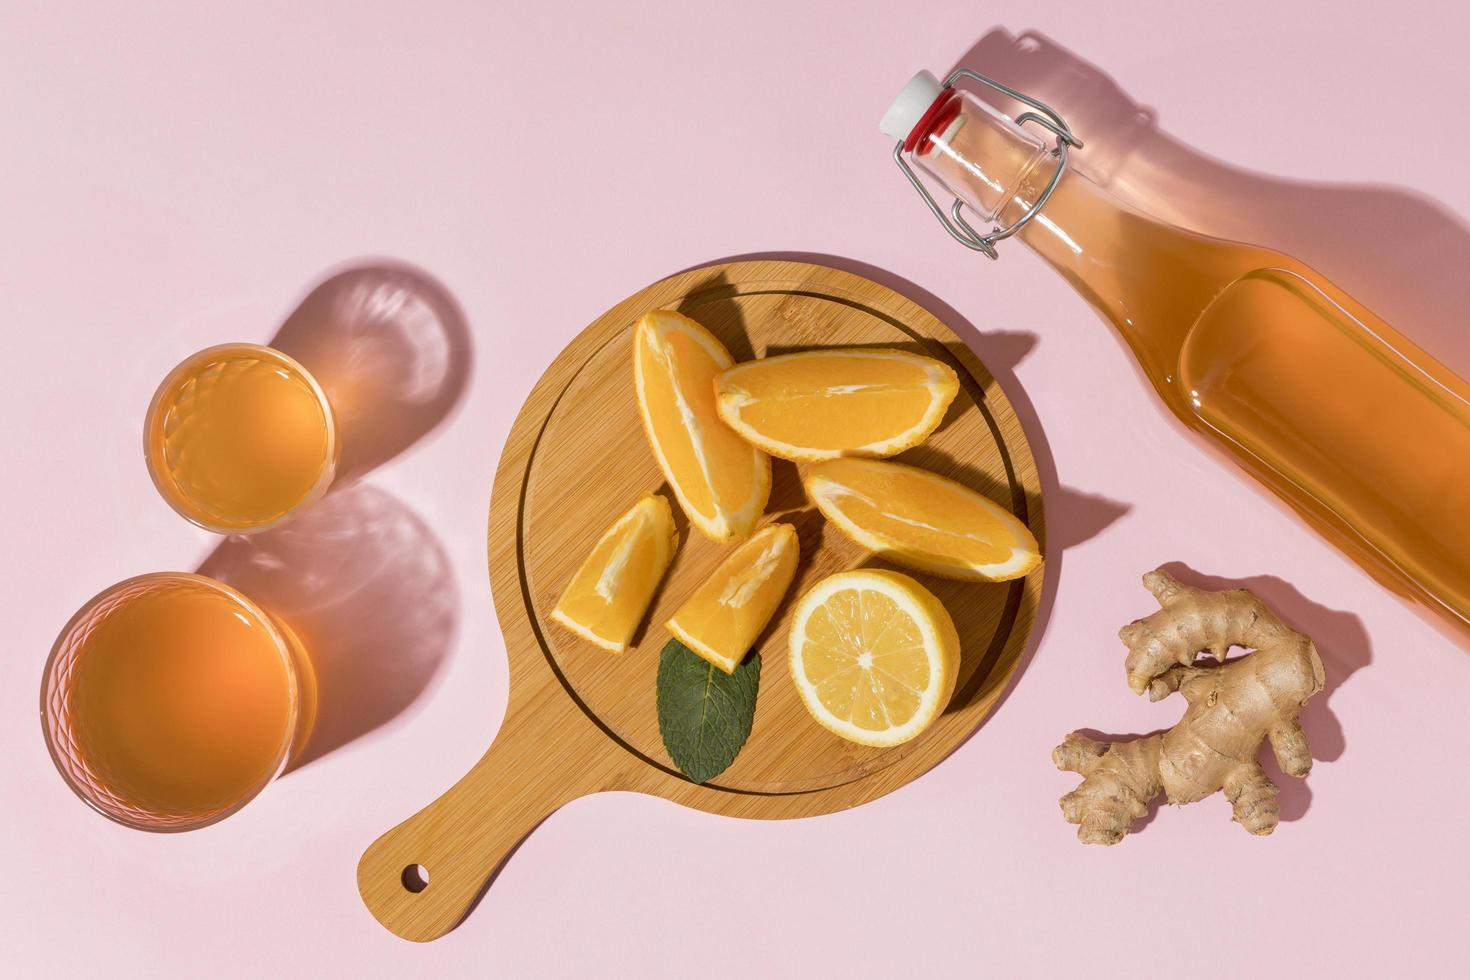 kombucha à l'orange et au gingembre photo